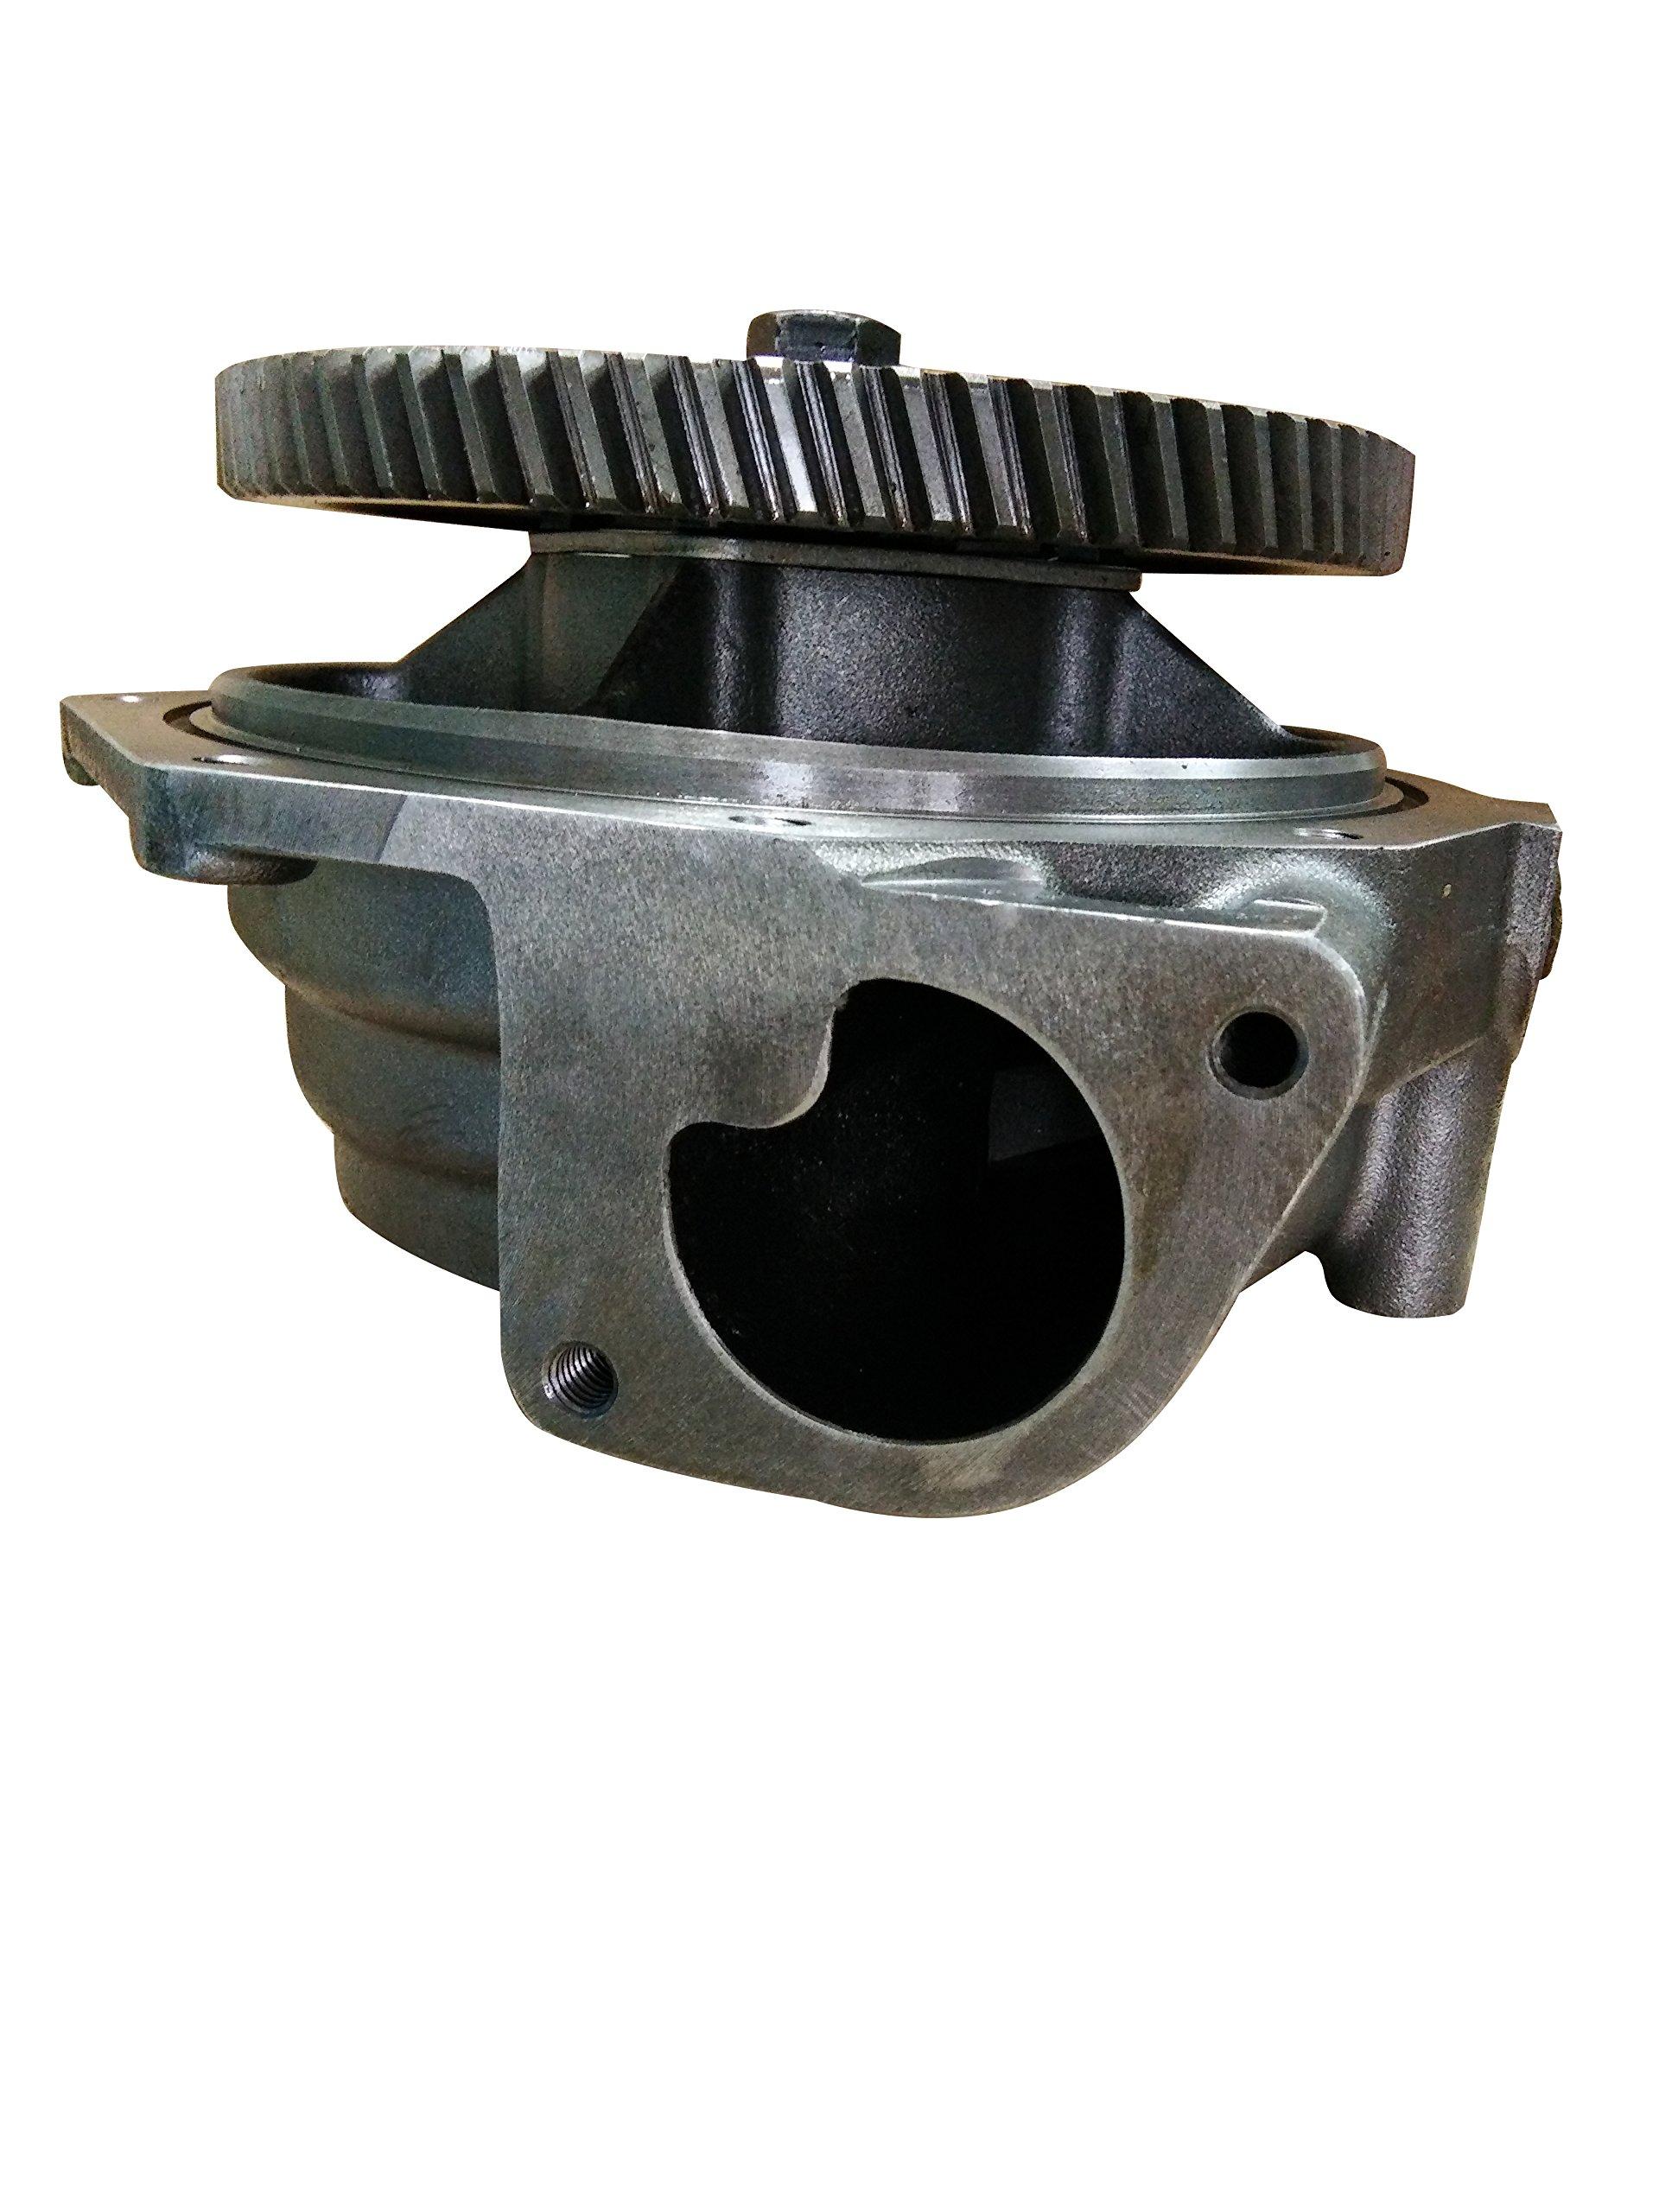 Cat Engine Parts, Water Pump (135-4926)